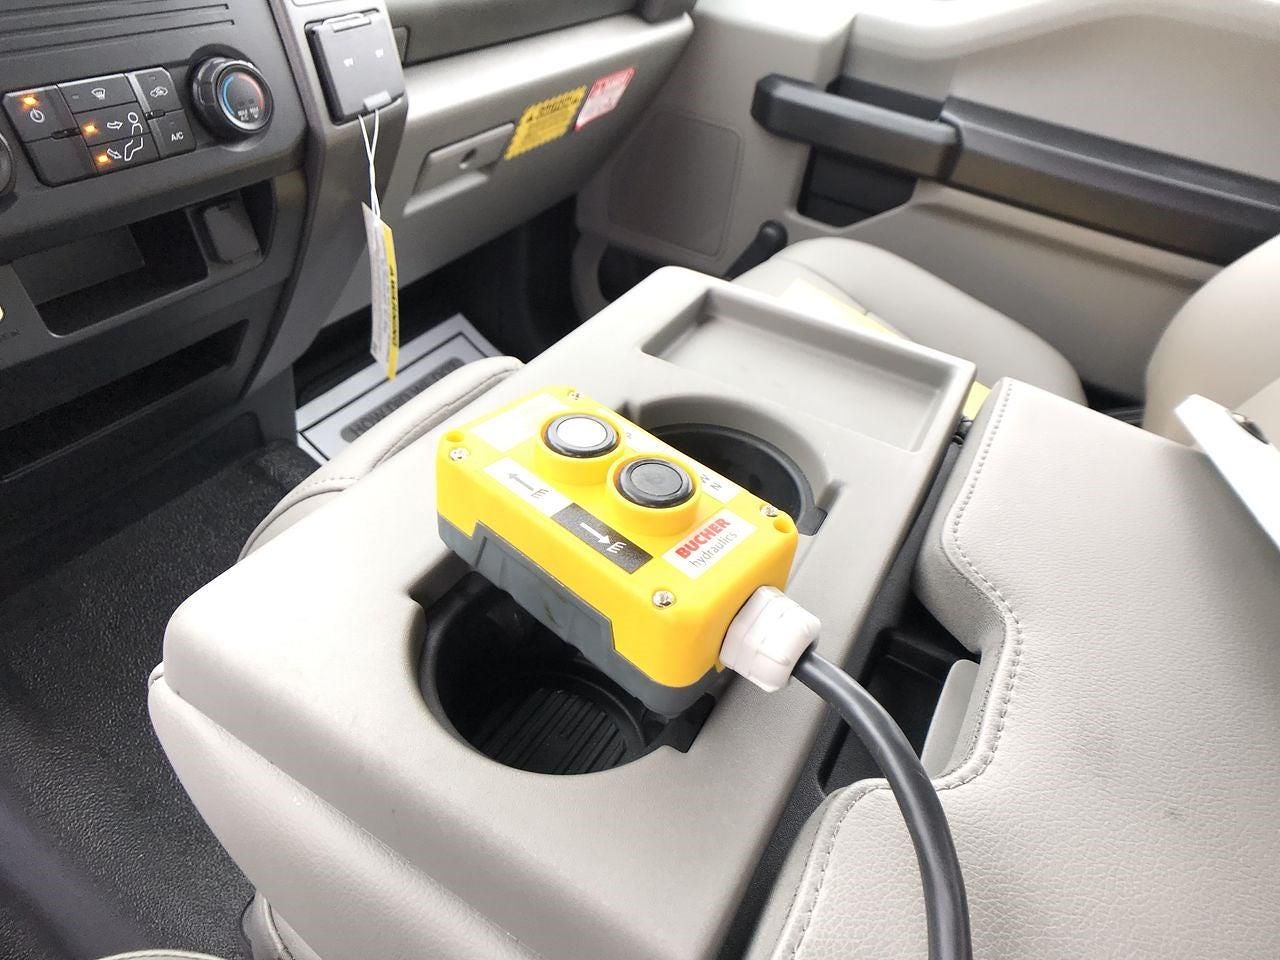 2019 Ford F-550 Regular Cab DRW 4x2, Dump Body #111522 - photo 11